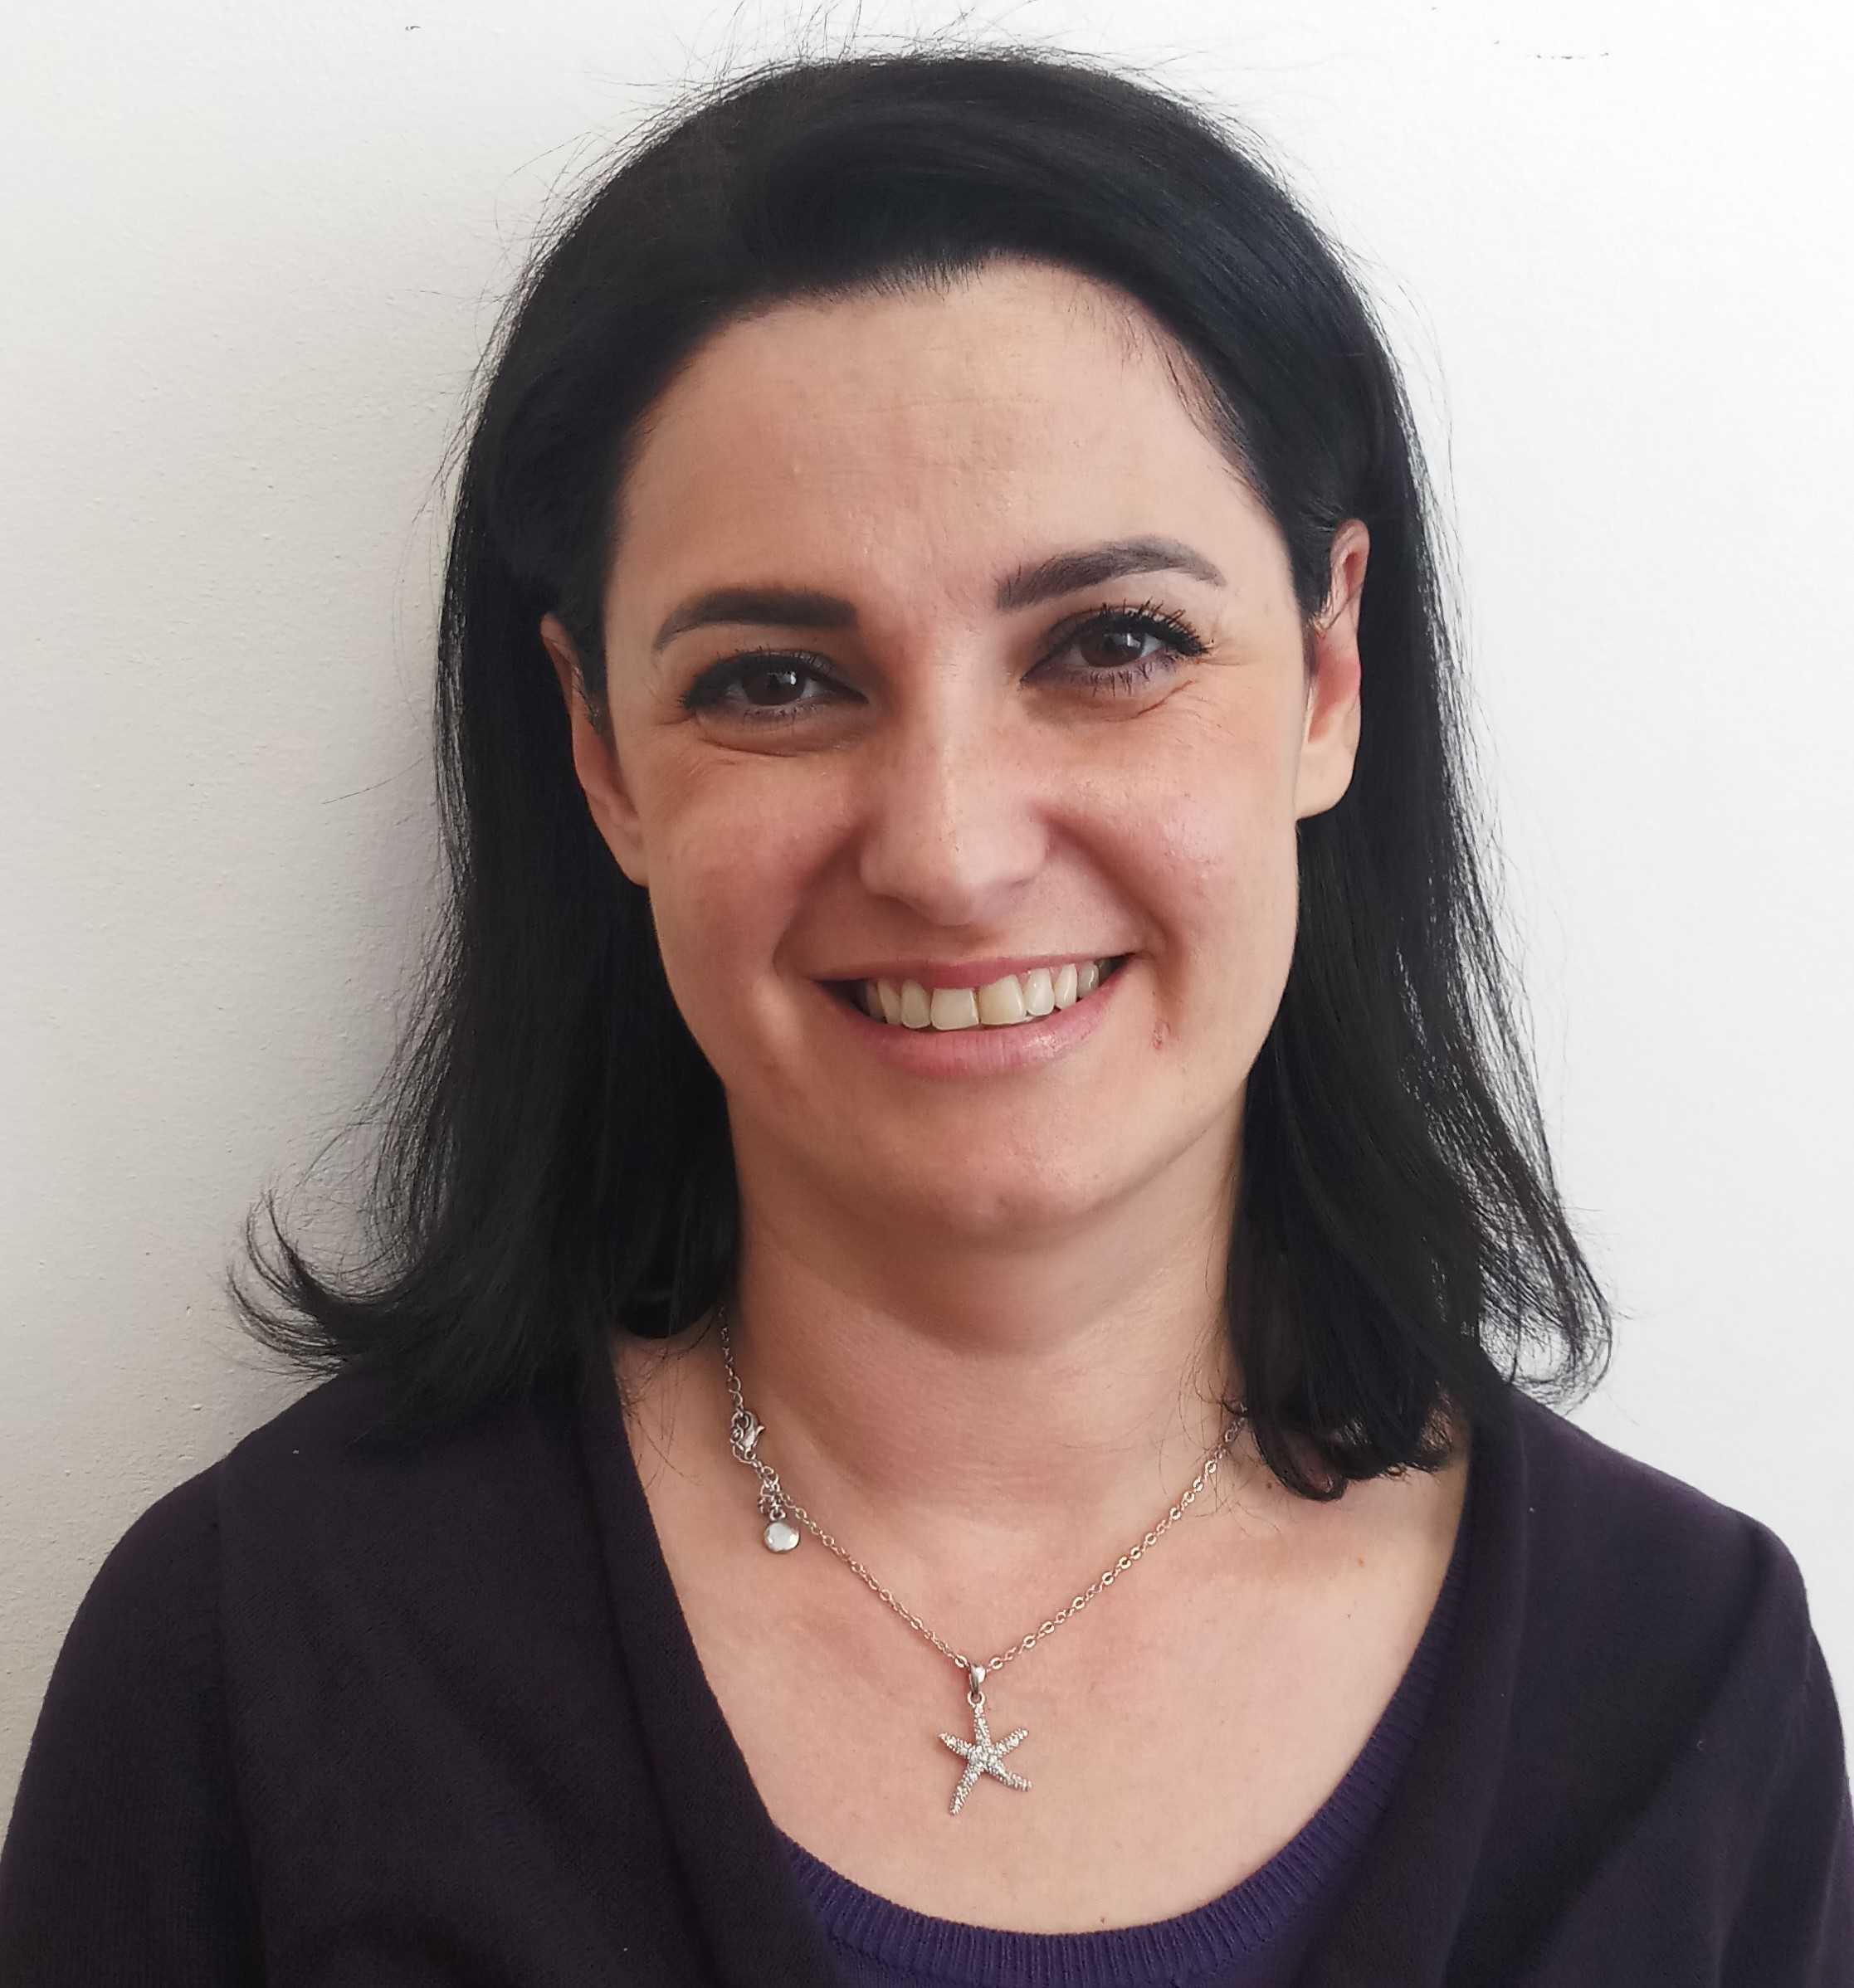 Albana Gashi